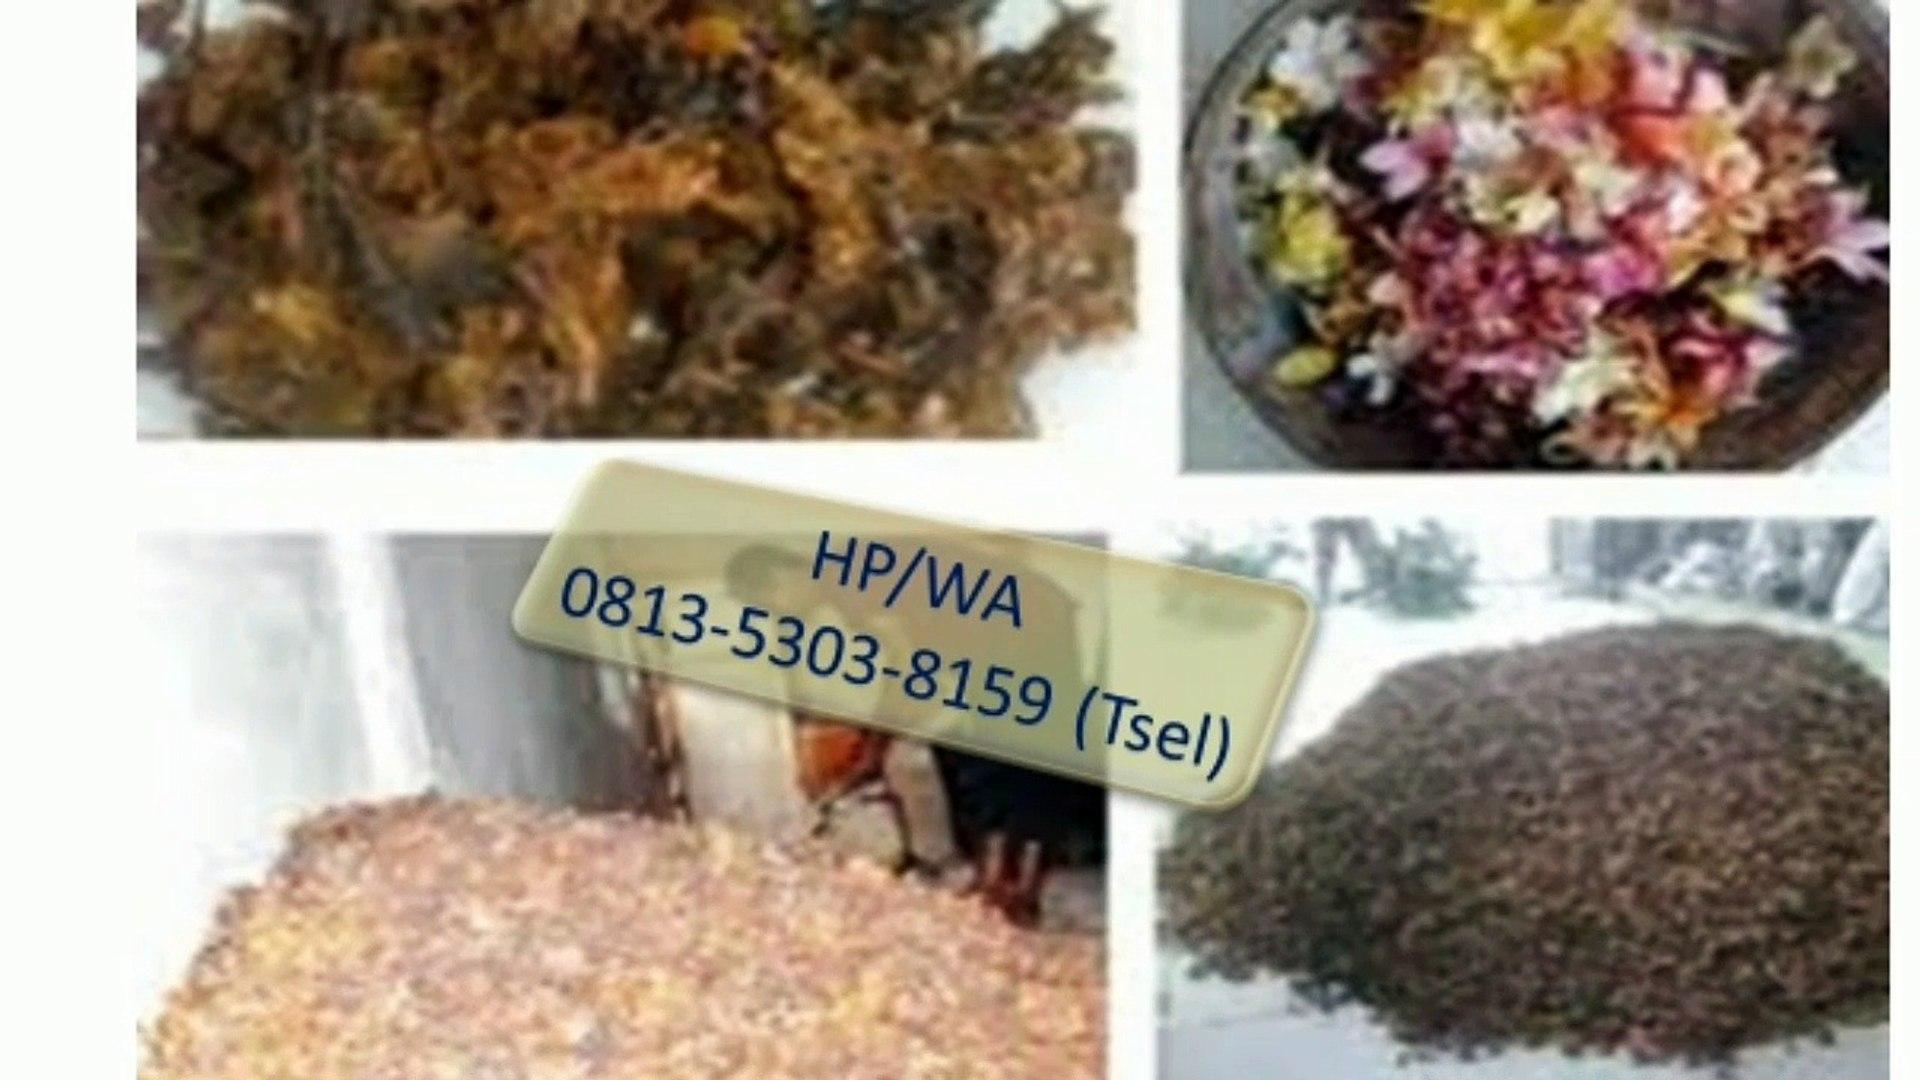 TERPERCAYA !!! HP/WA : 0813-5303-8159 (Tsel) Jual Bunga Kamboja di Kota Denpasar